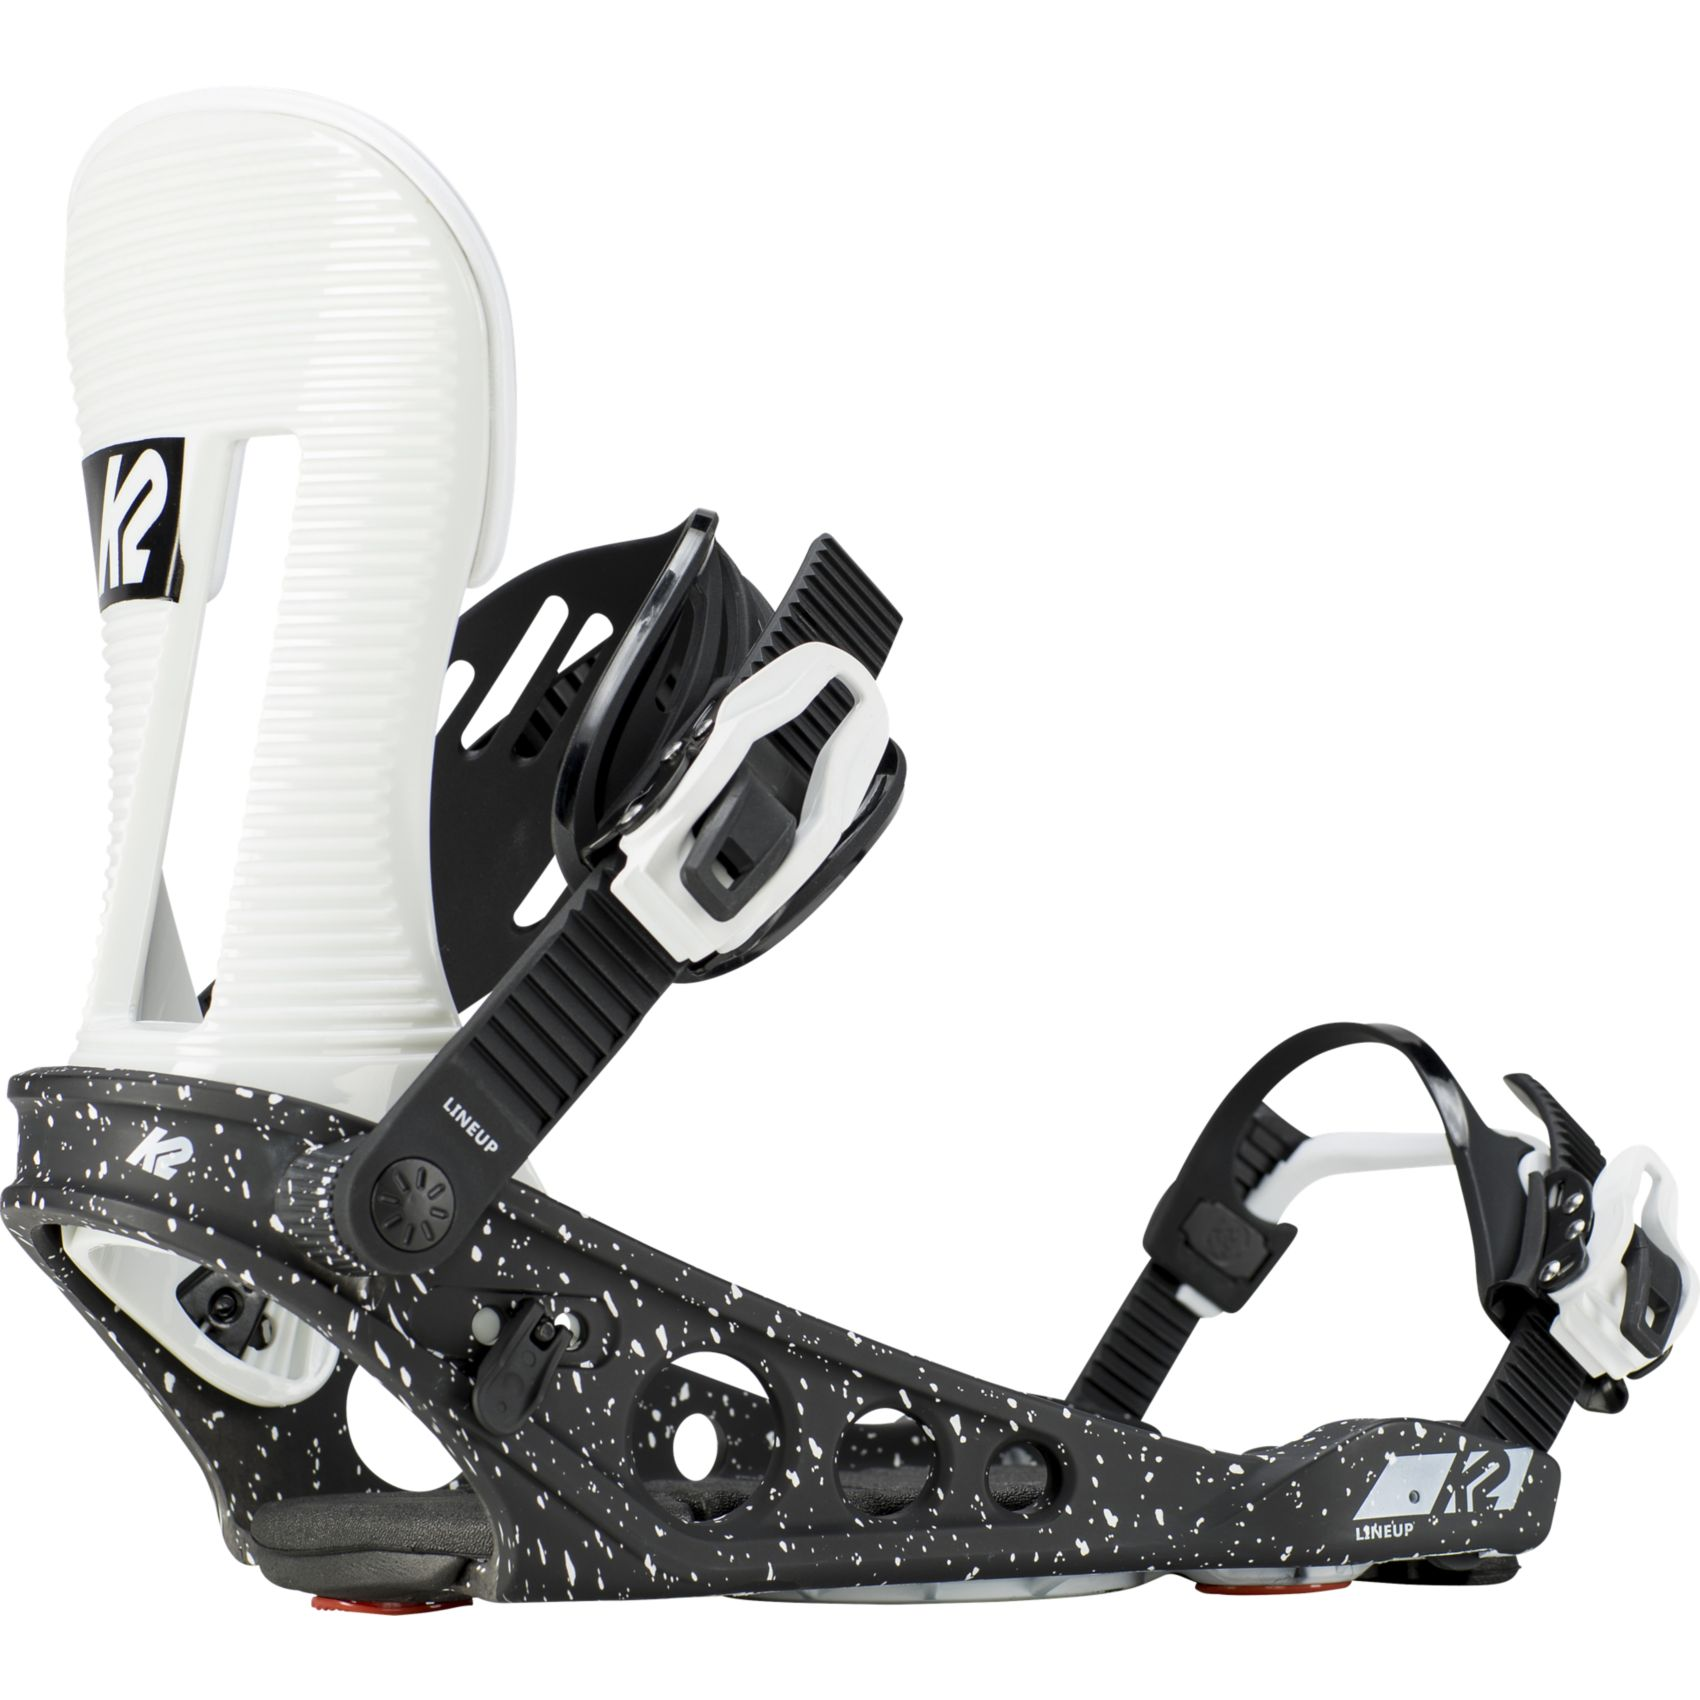 2df6d7961266 K2 Lineup Snowboard Binding 2019